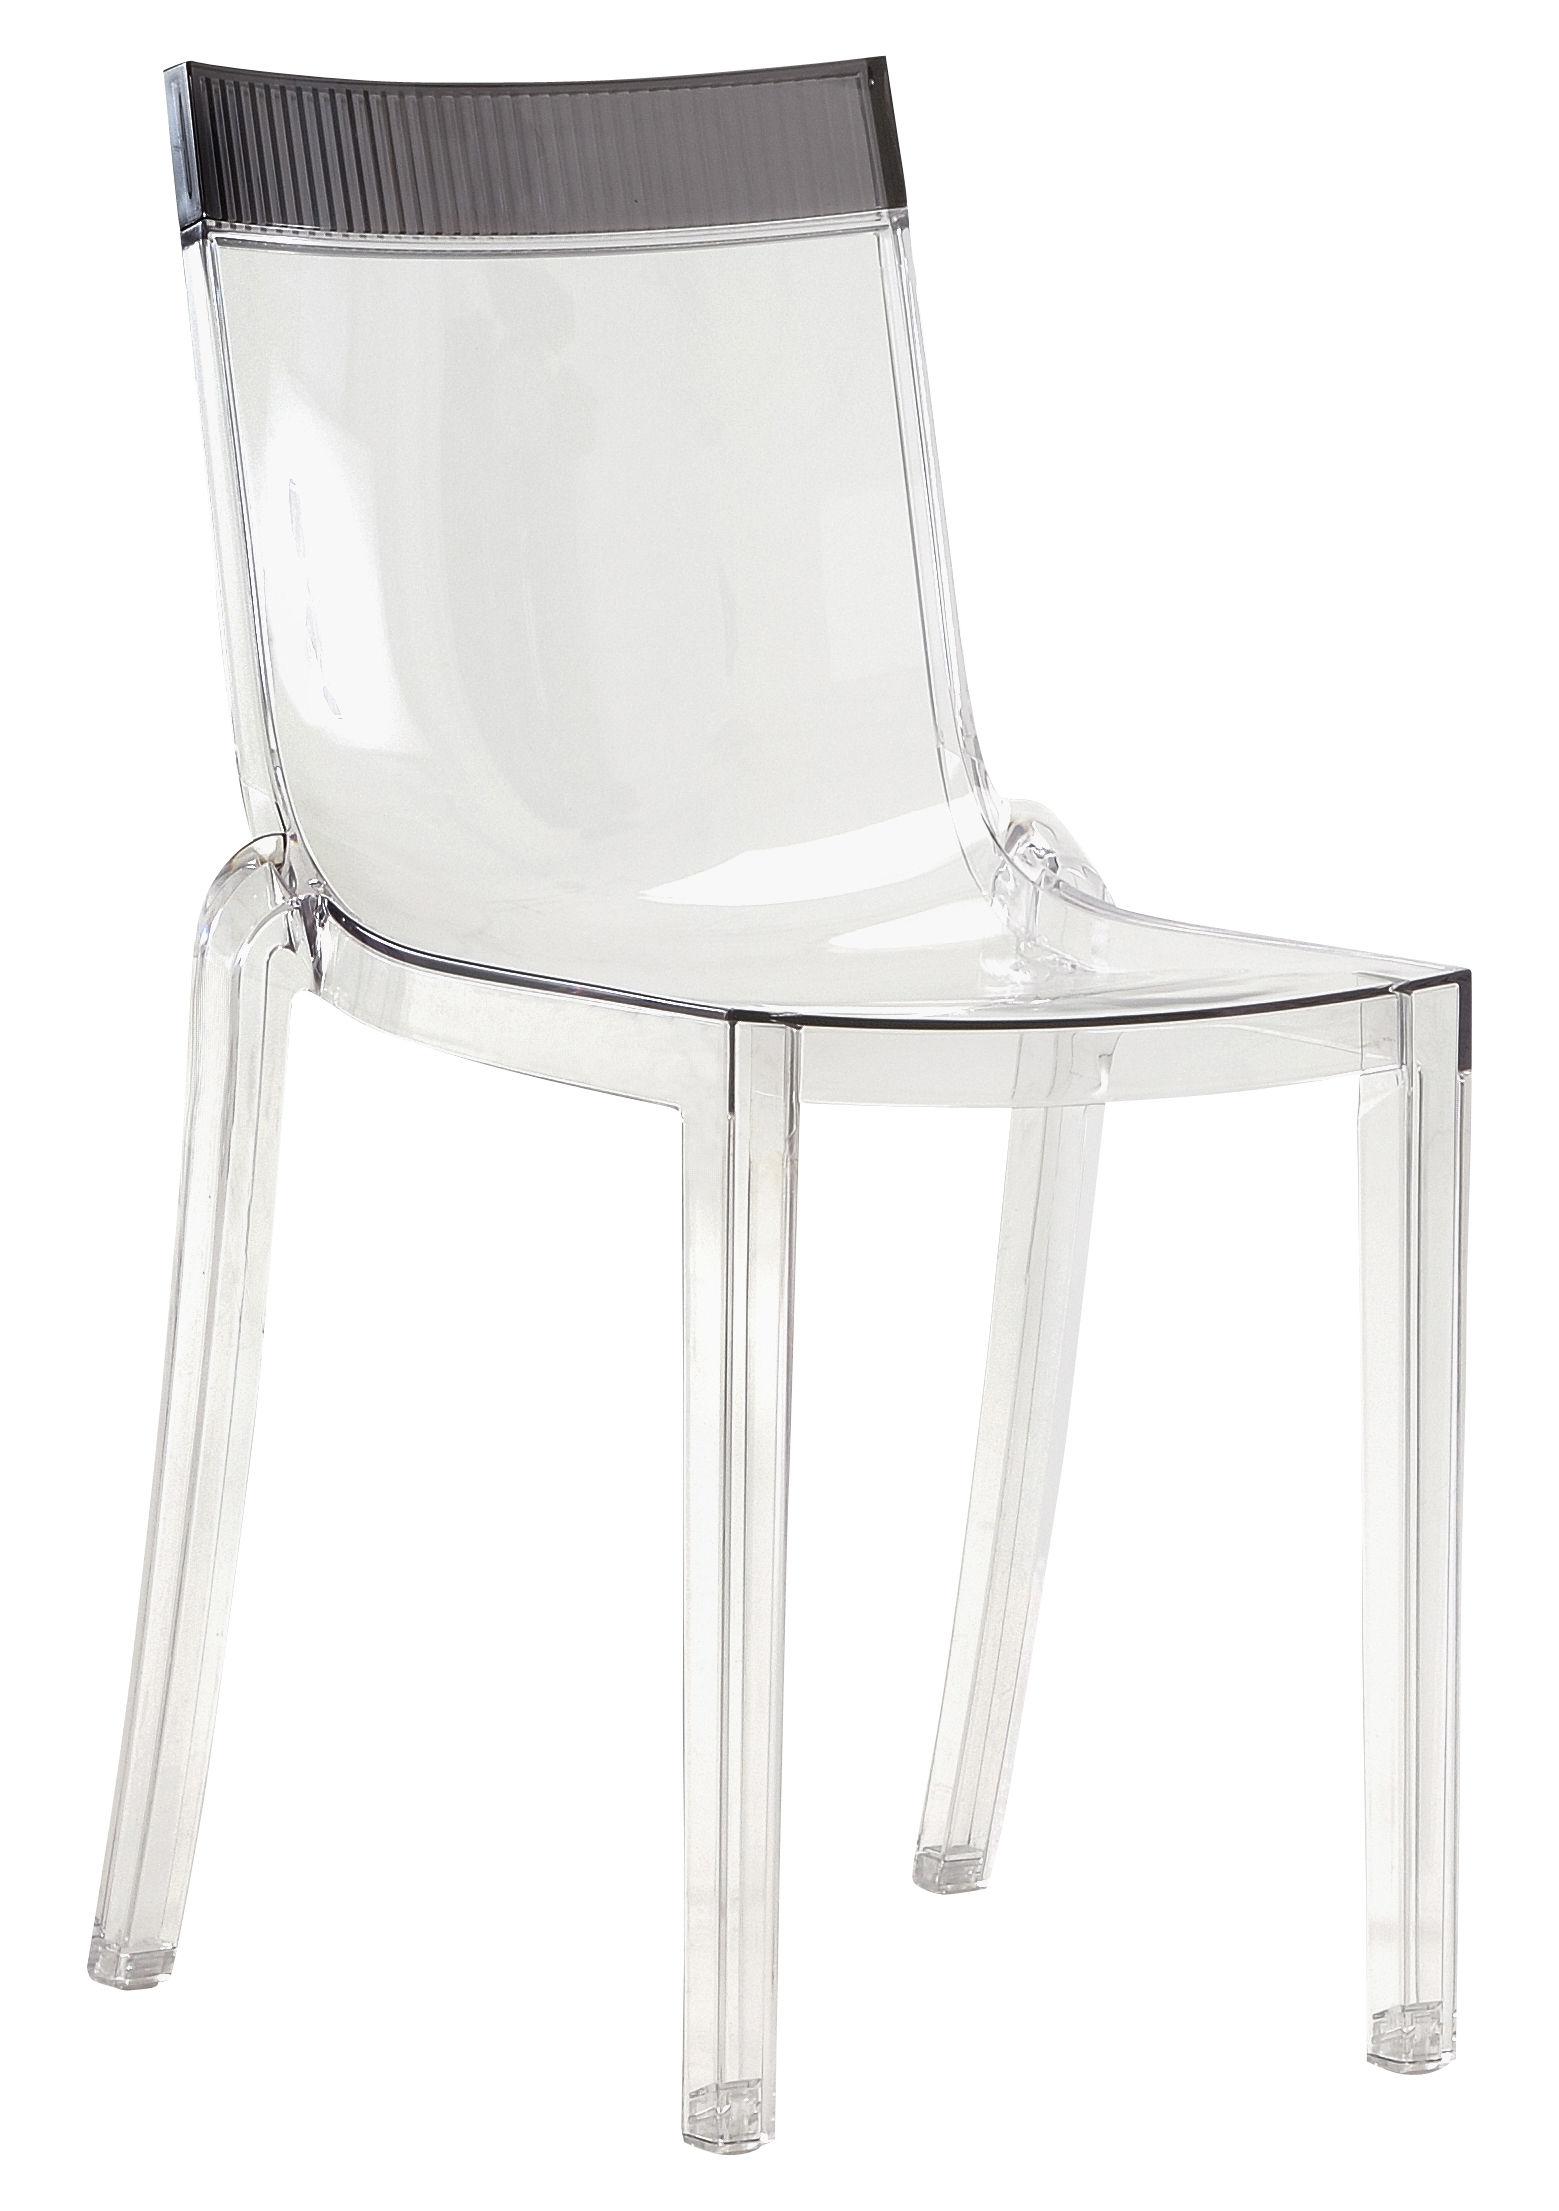 Chaise empilable hi cut transparente polycarbonate cristal rouge kartell - Chaise transparente rouge ...